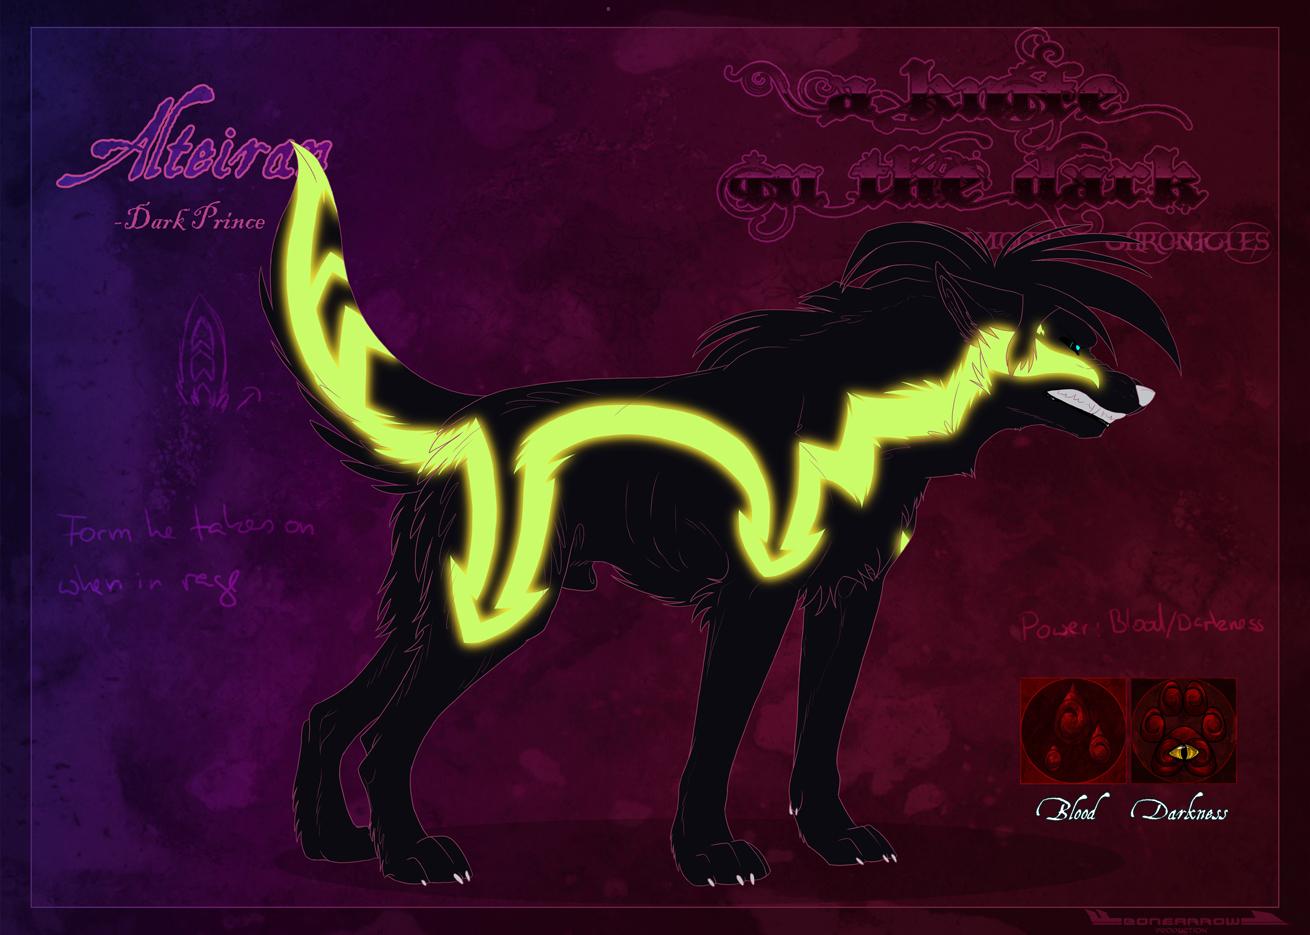 dddsssssss Akitd__dark_alteiran_cs_by_icekrystal-d4837iu